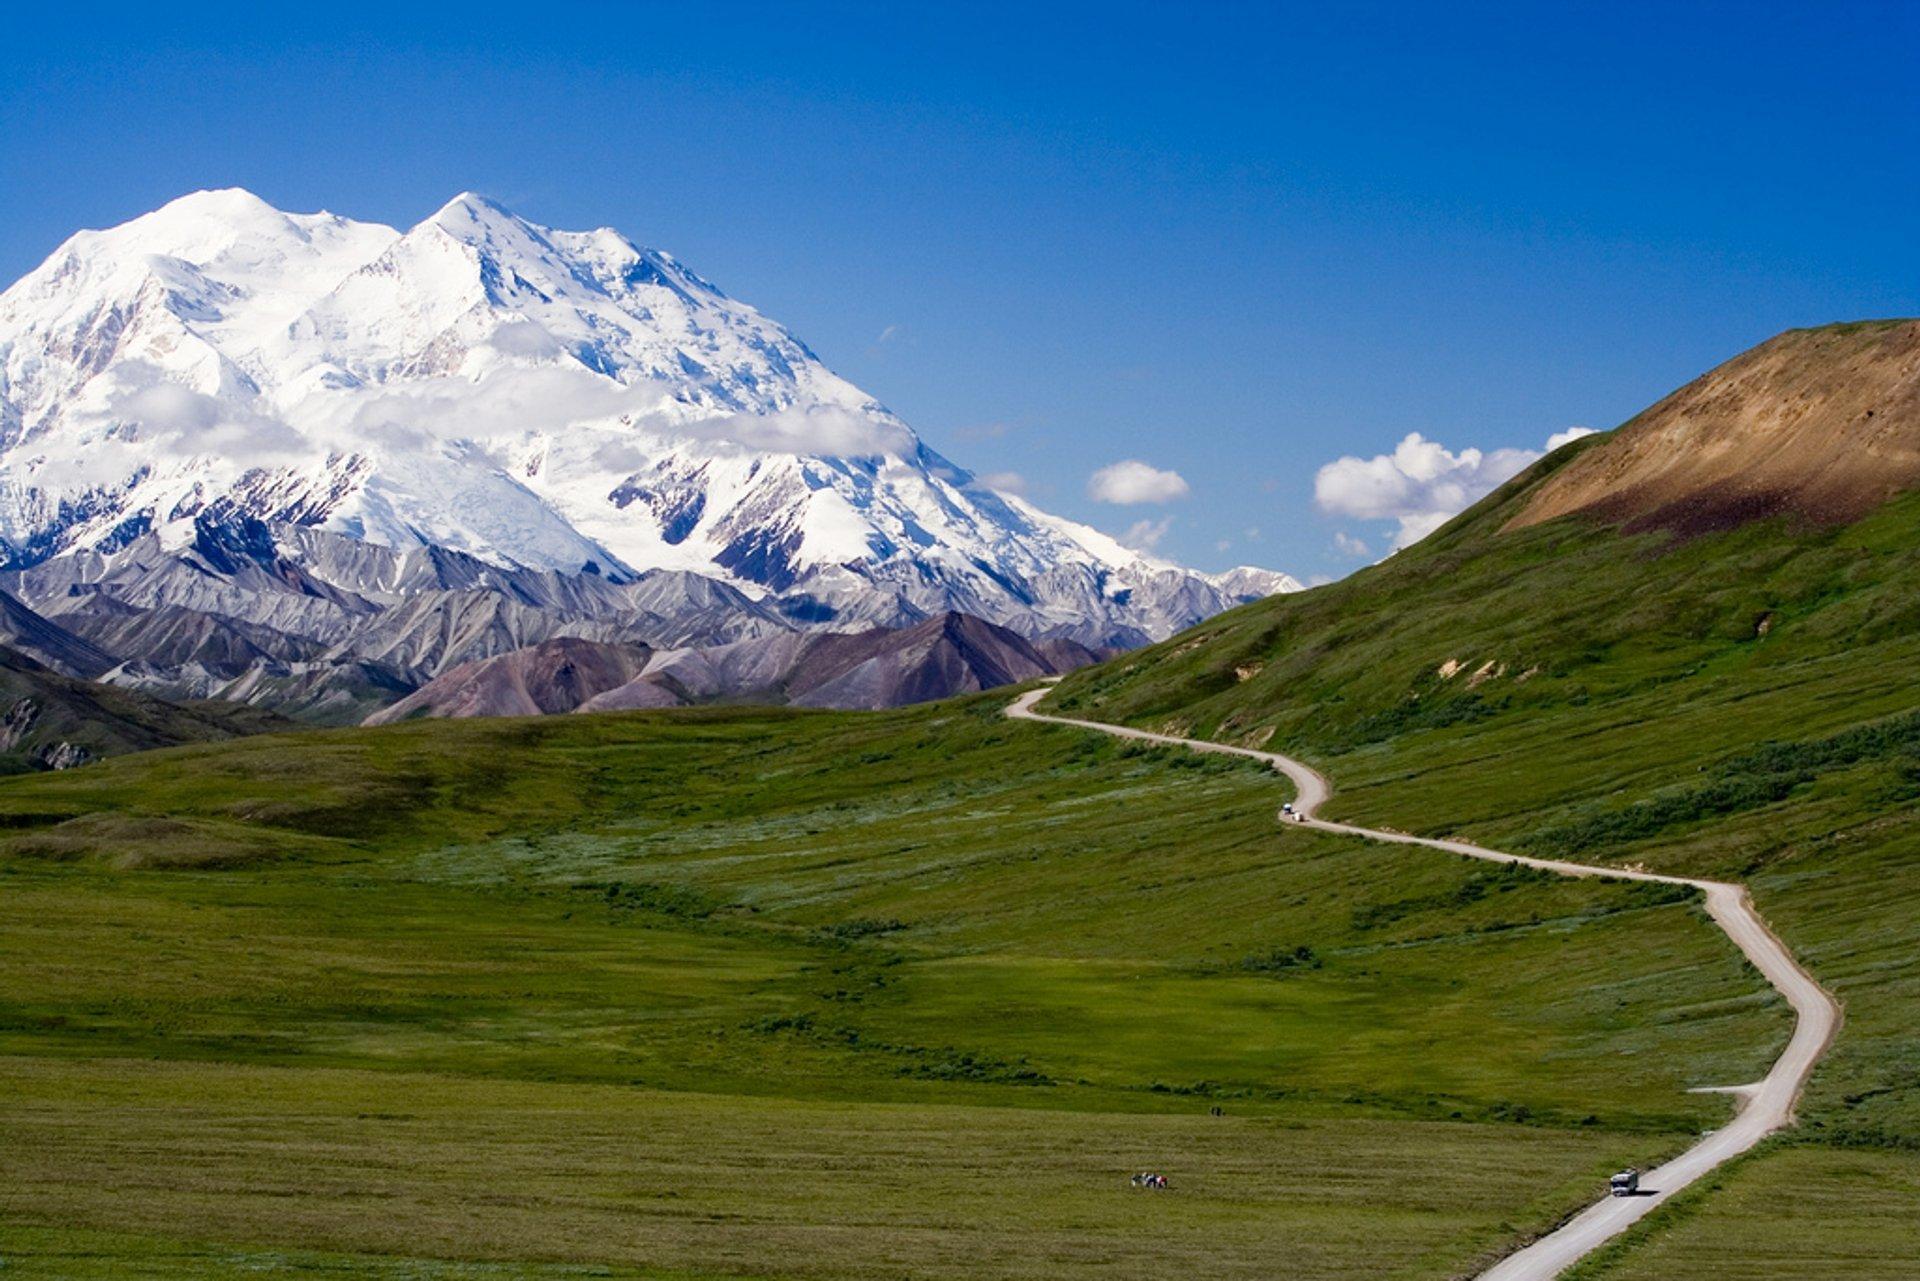 Denali in Alaska 2020 - Best Time